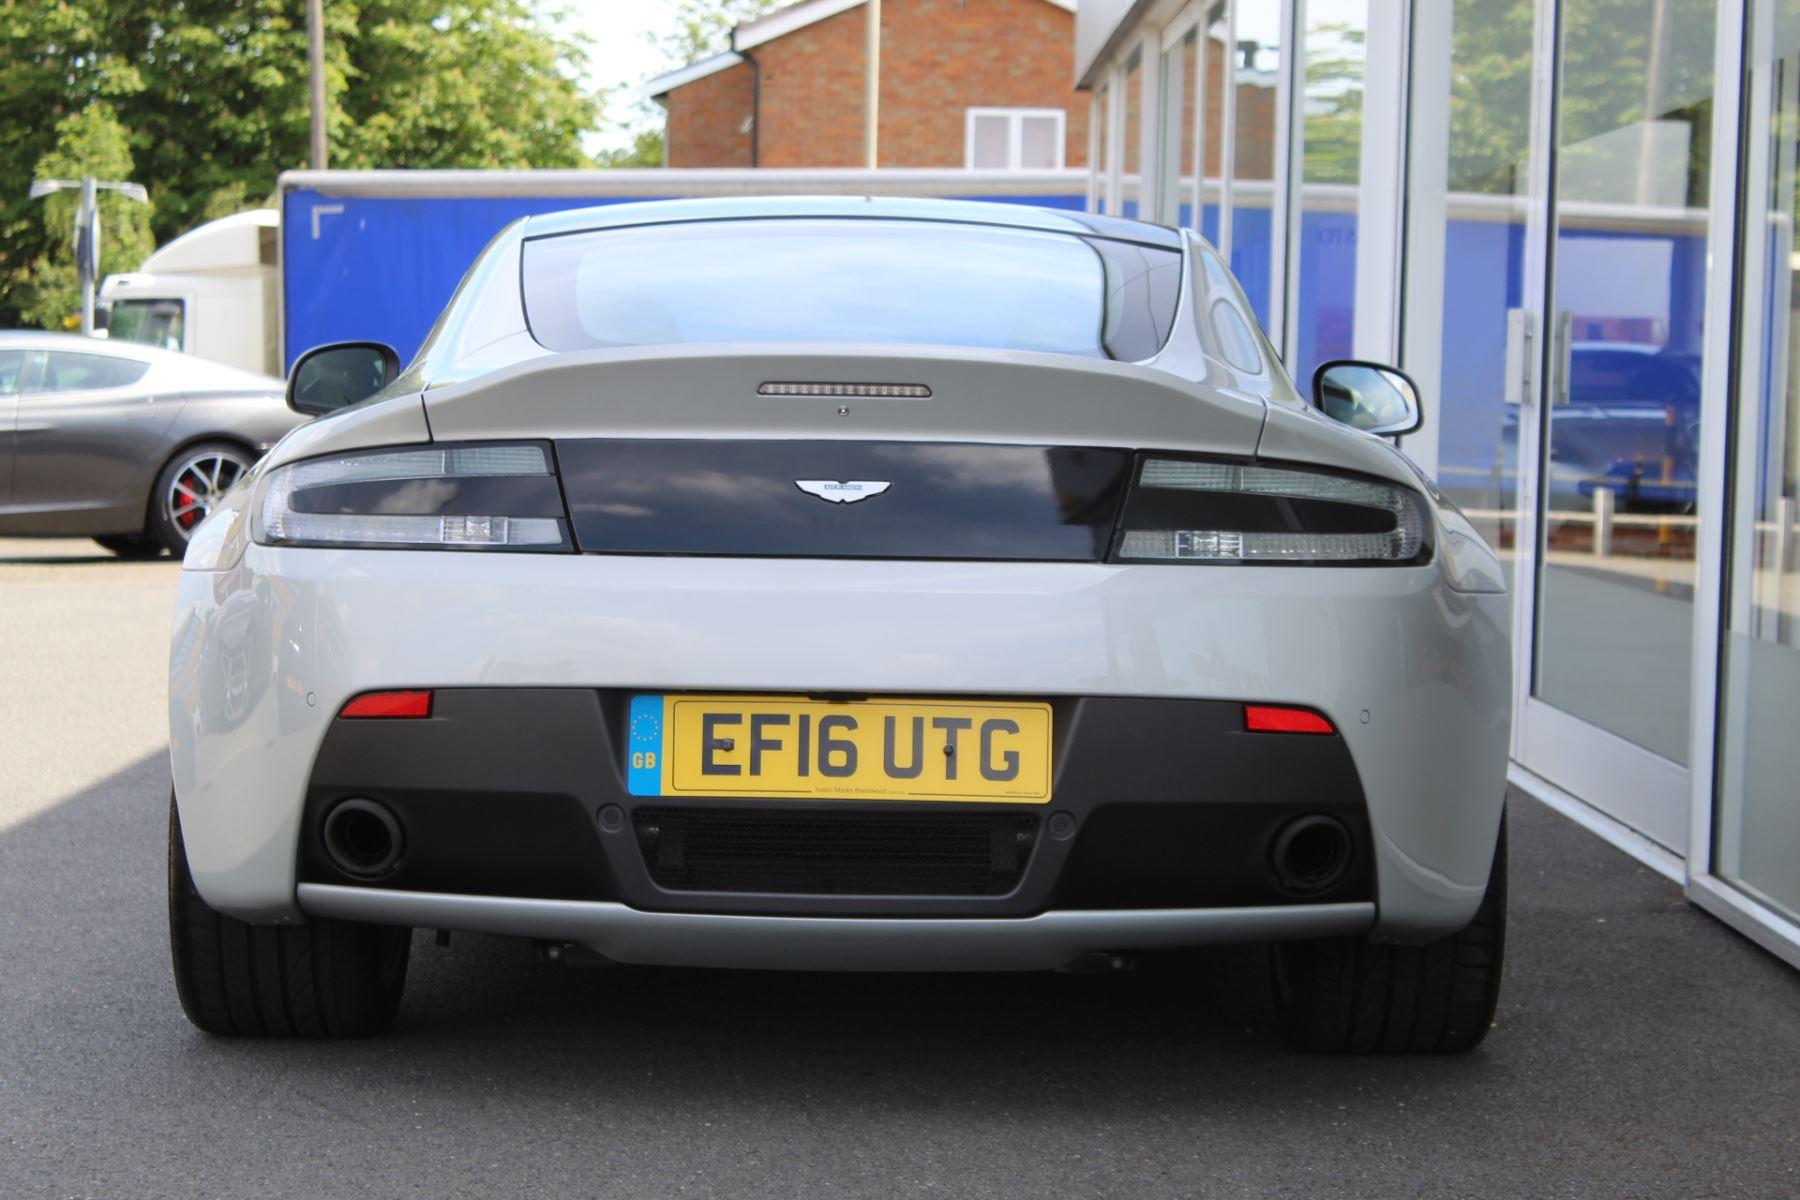 Aston Martin V8 Vantage Coupe 2dr [420] Latest Dash, 420BHP image 15